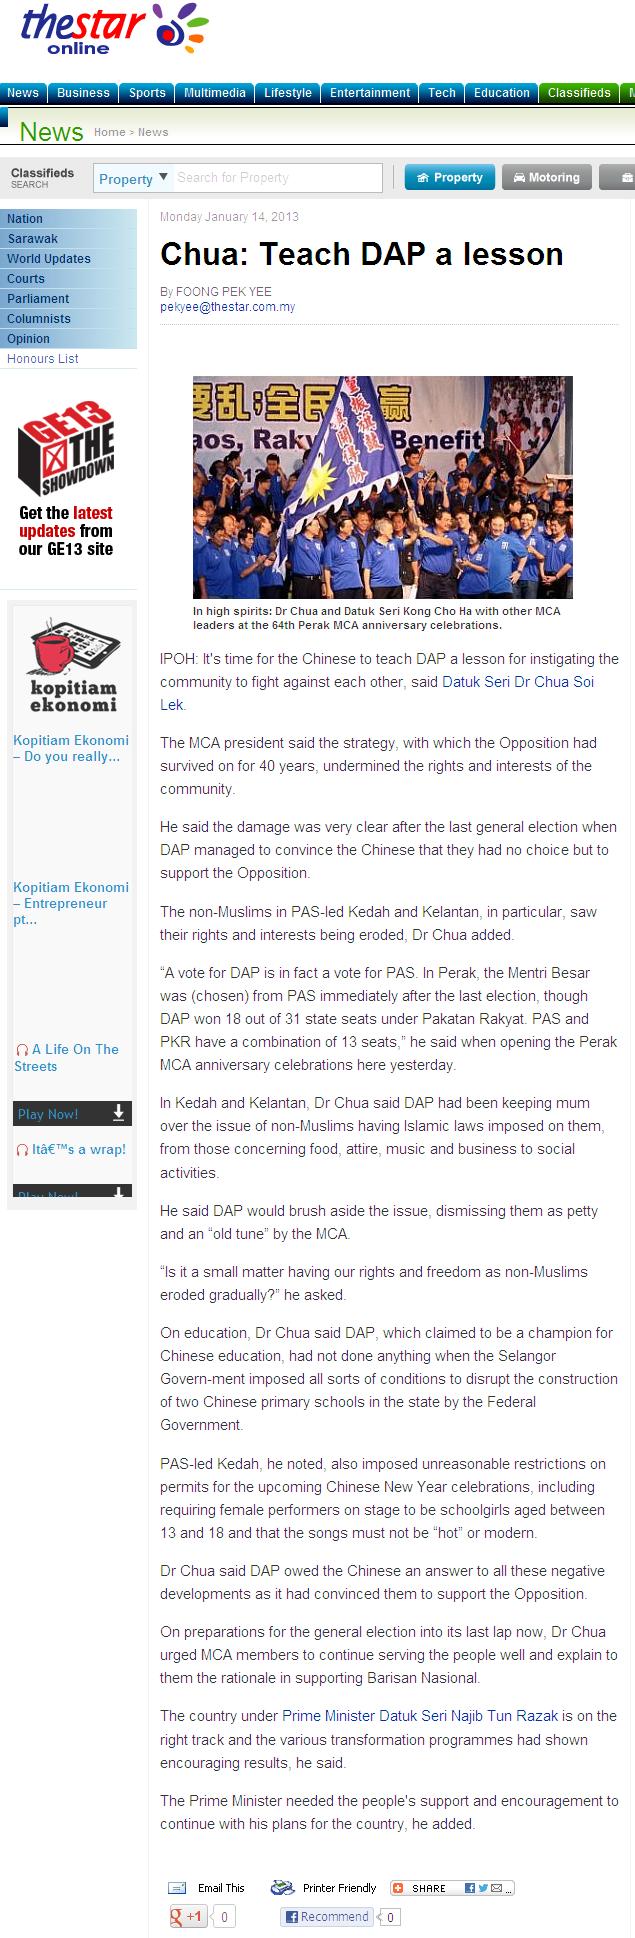 Chua Teach DAP a lesson-StoryThe Star Online 2013-04-13 09-37-35